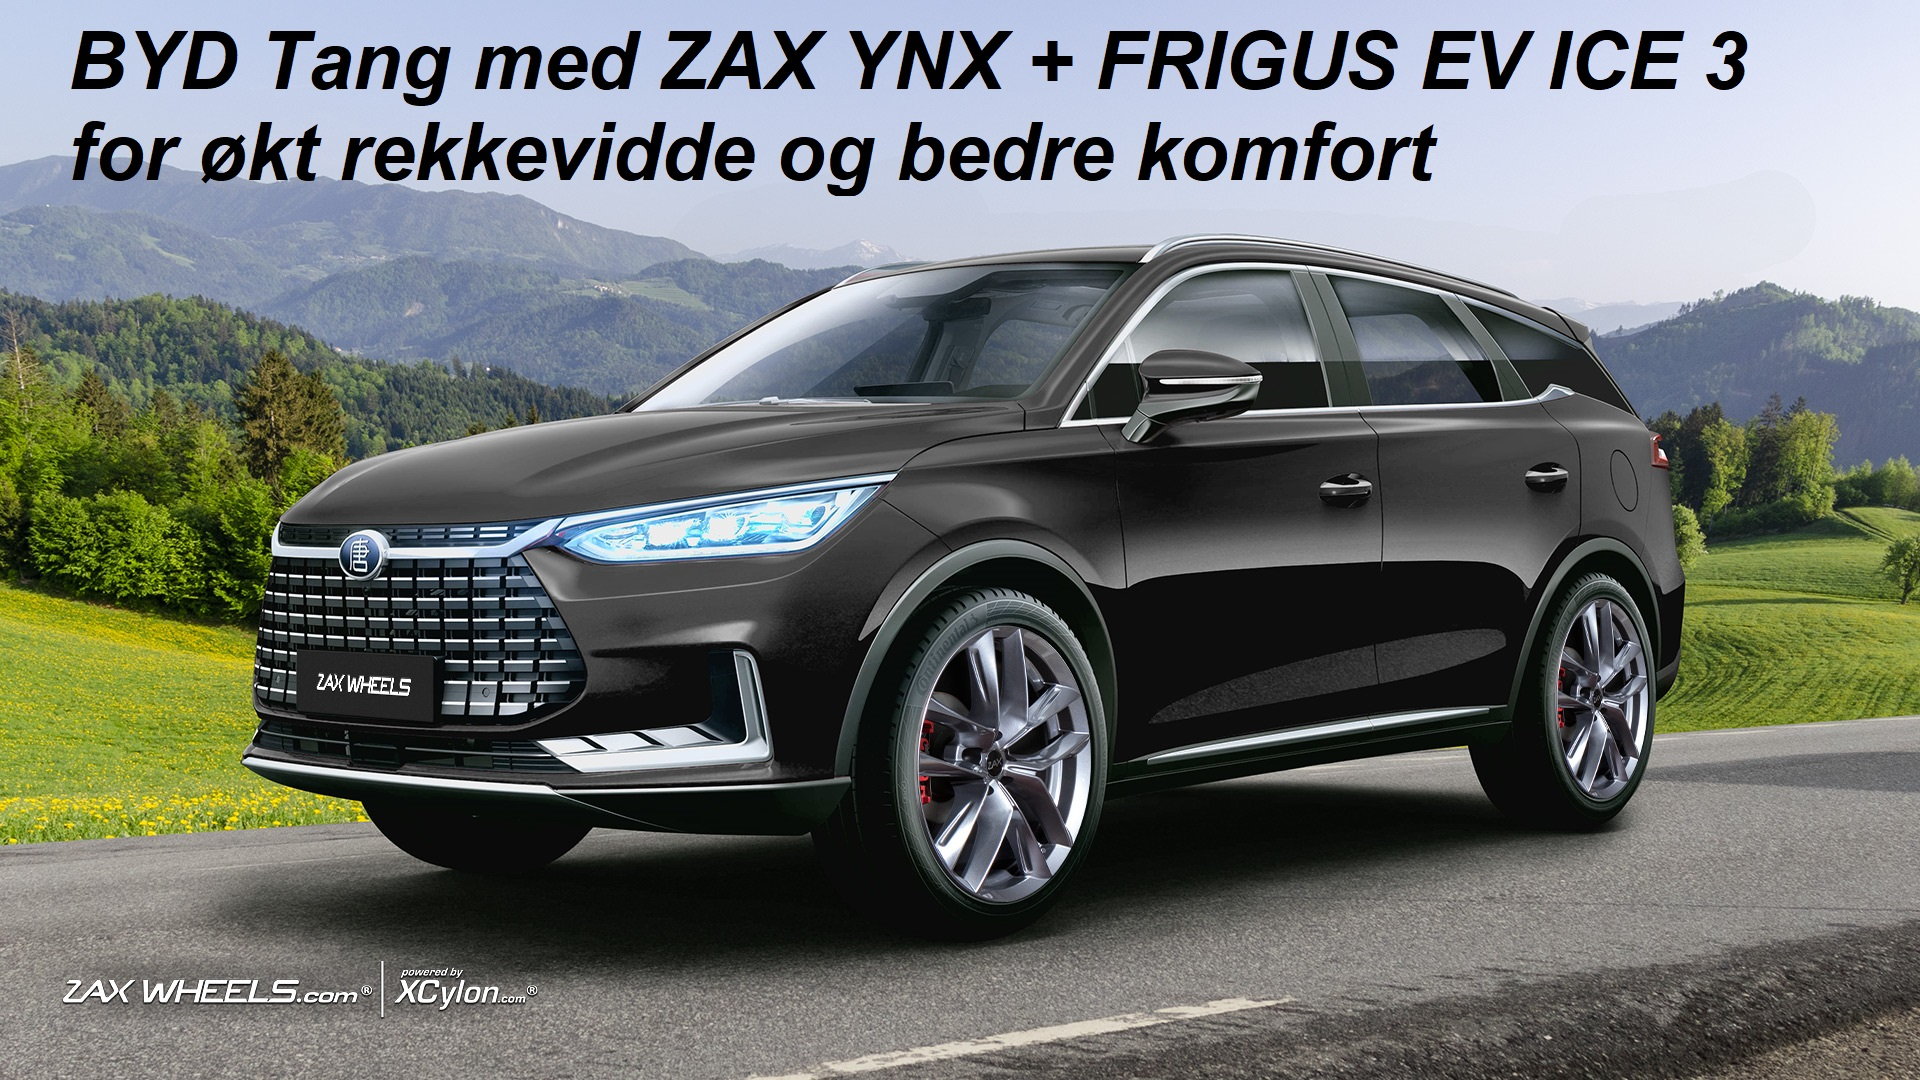 vinterhjul-felger-byd-tang-ev-zax-wheels